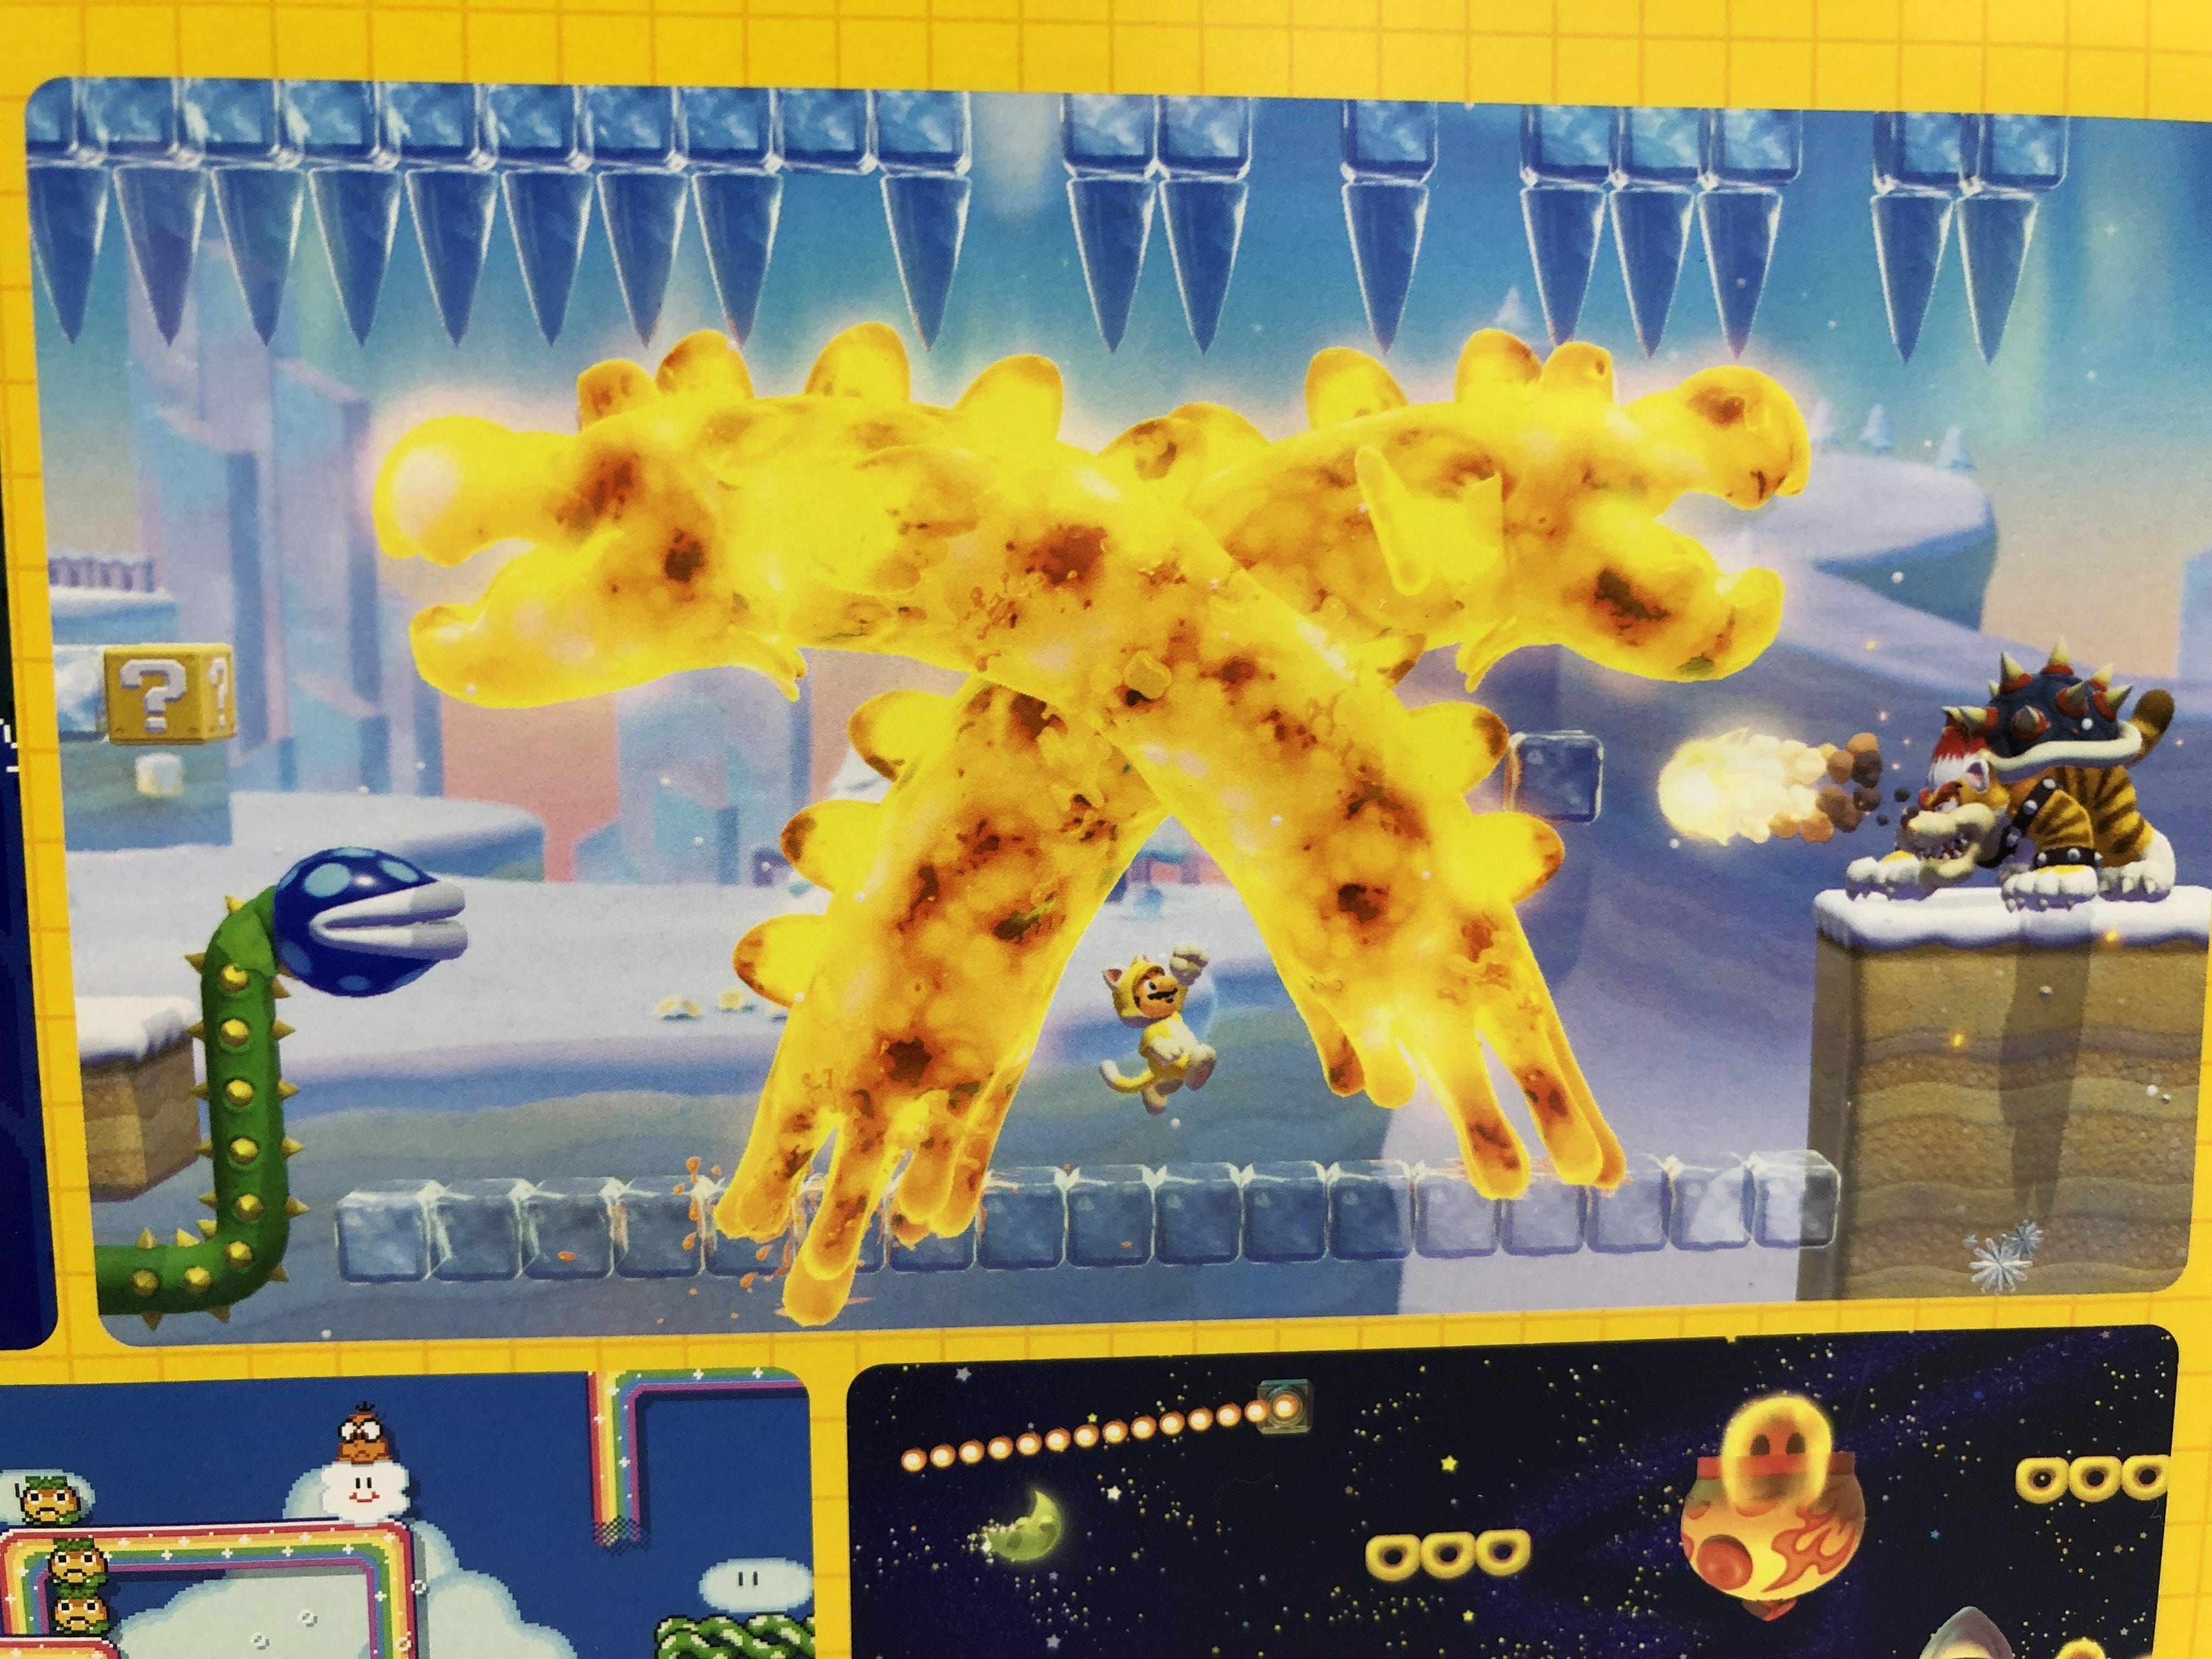 Super Mario Maker 2 Details Leaked - Cat Bowser Confirmed and More!